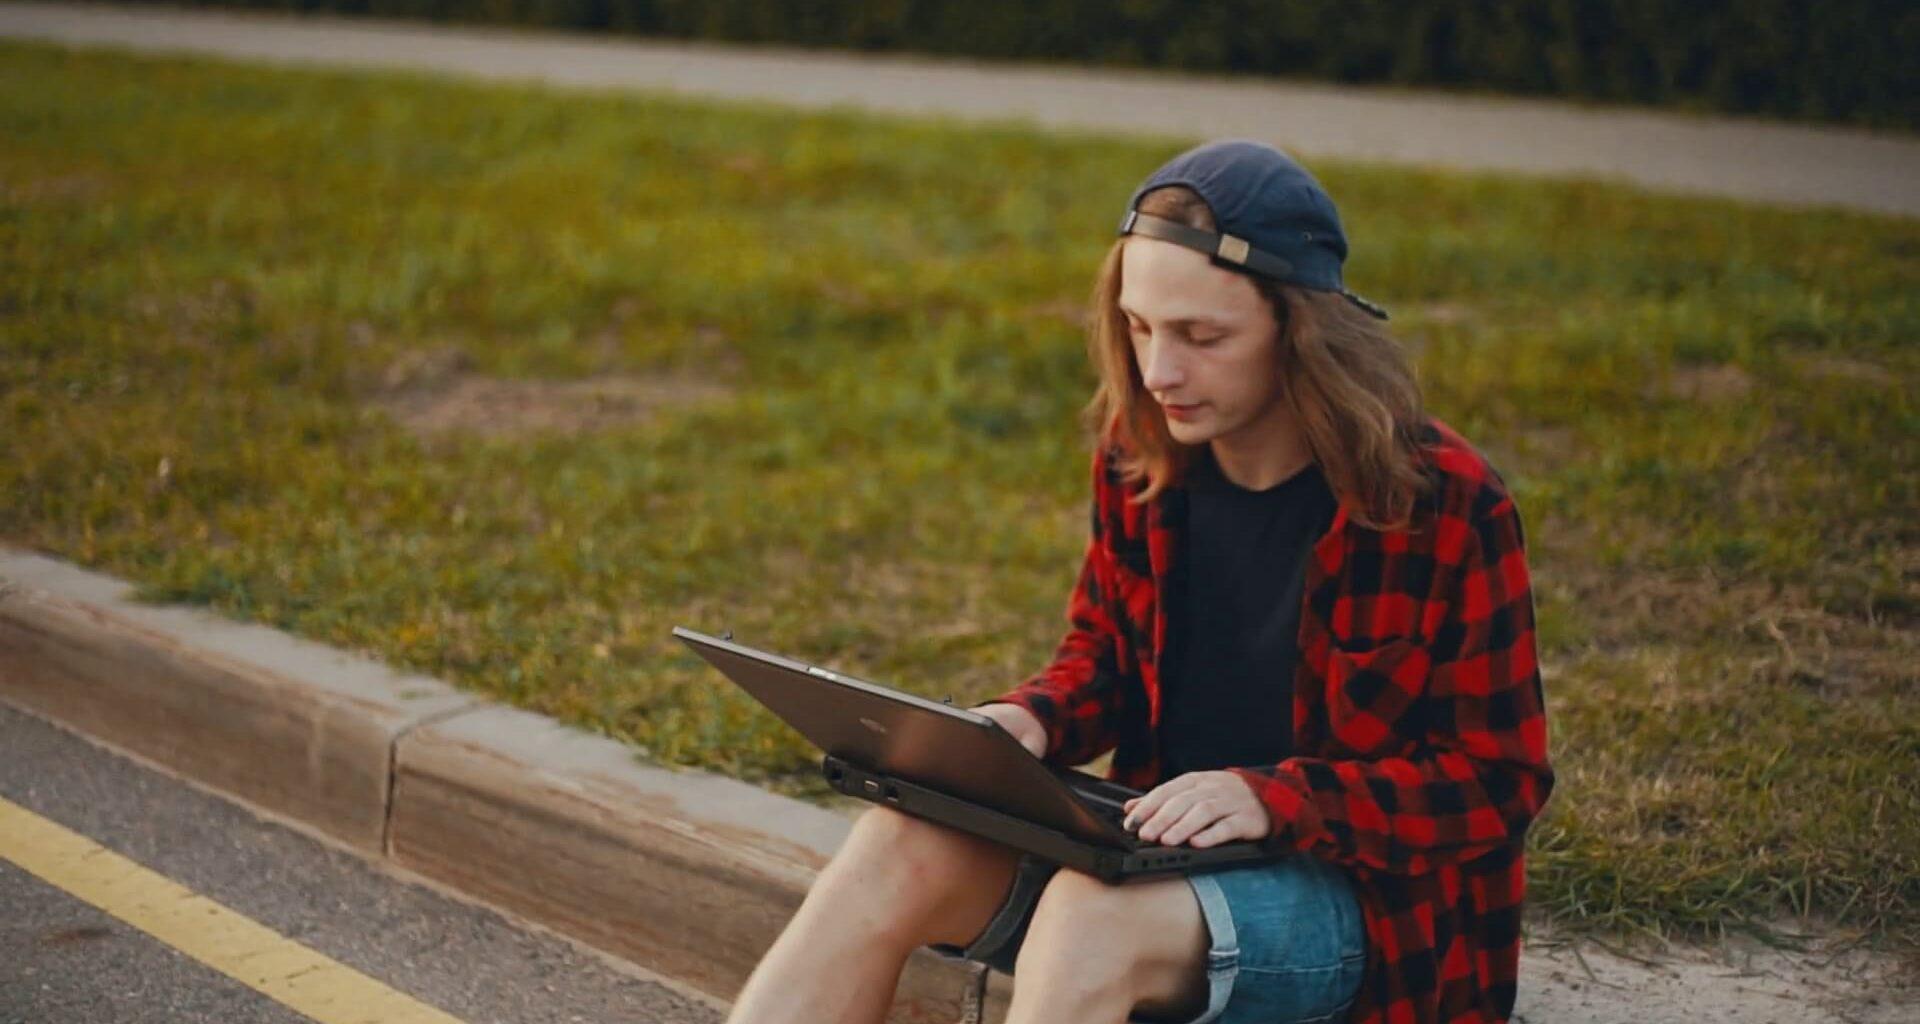 Young man looking at his laptop